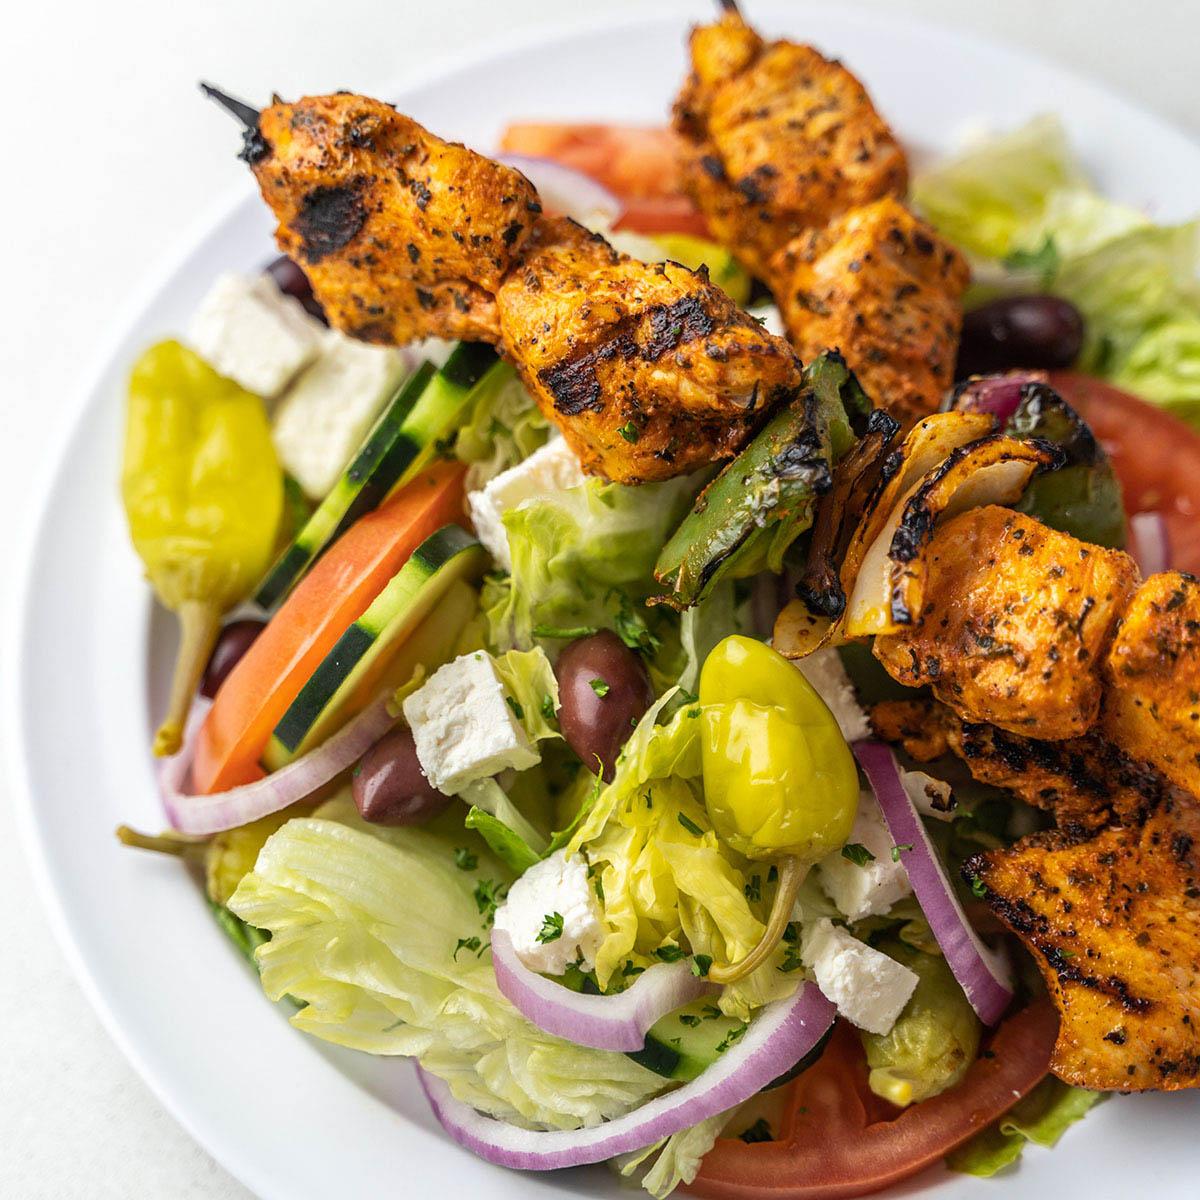 keto diet friendly grilled shrimp kabob